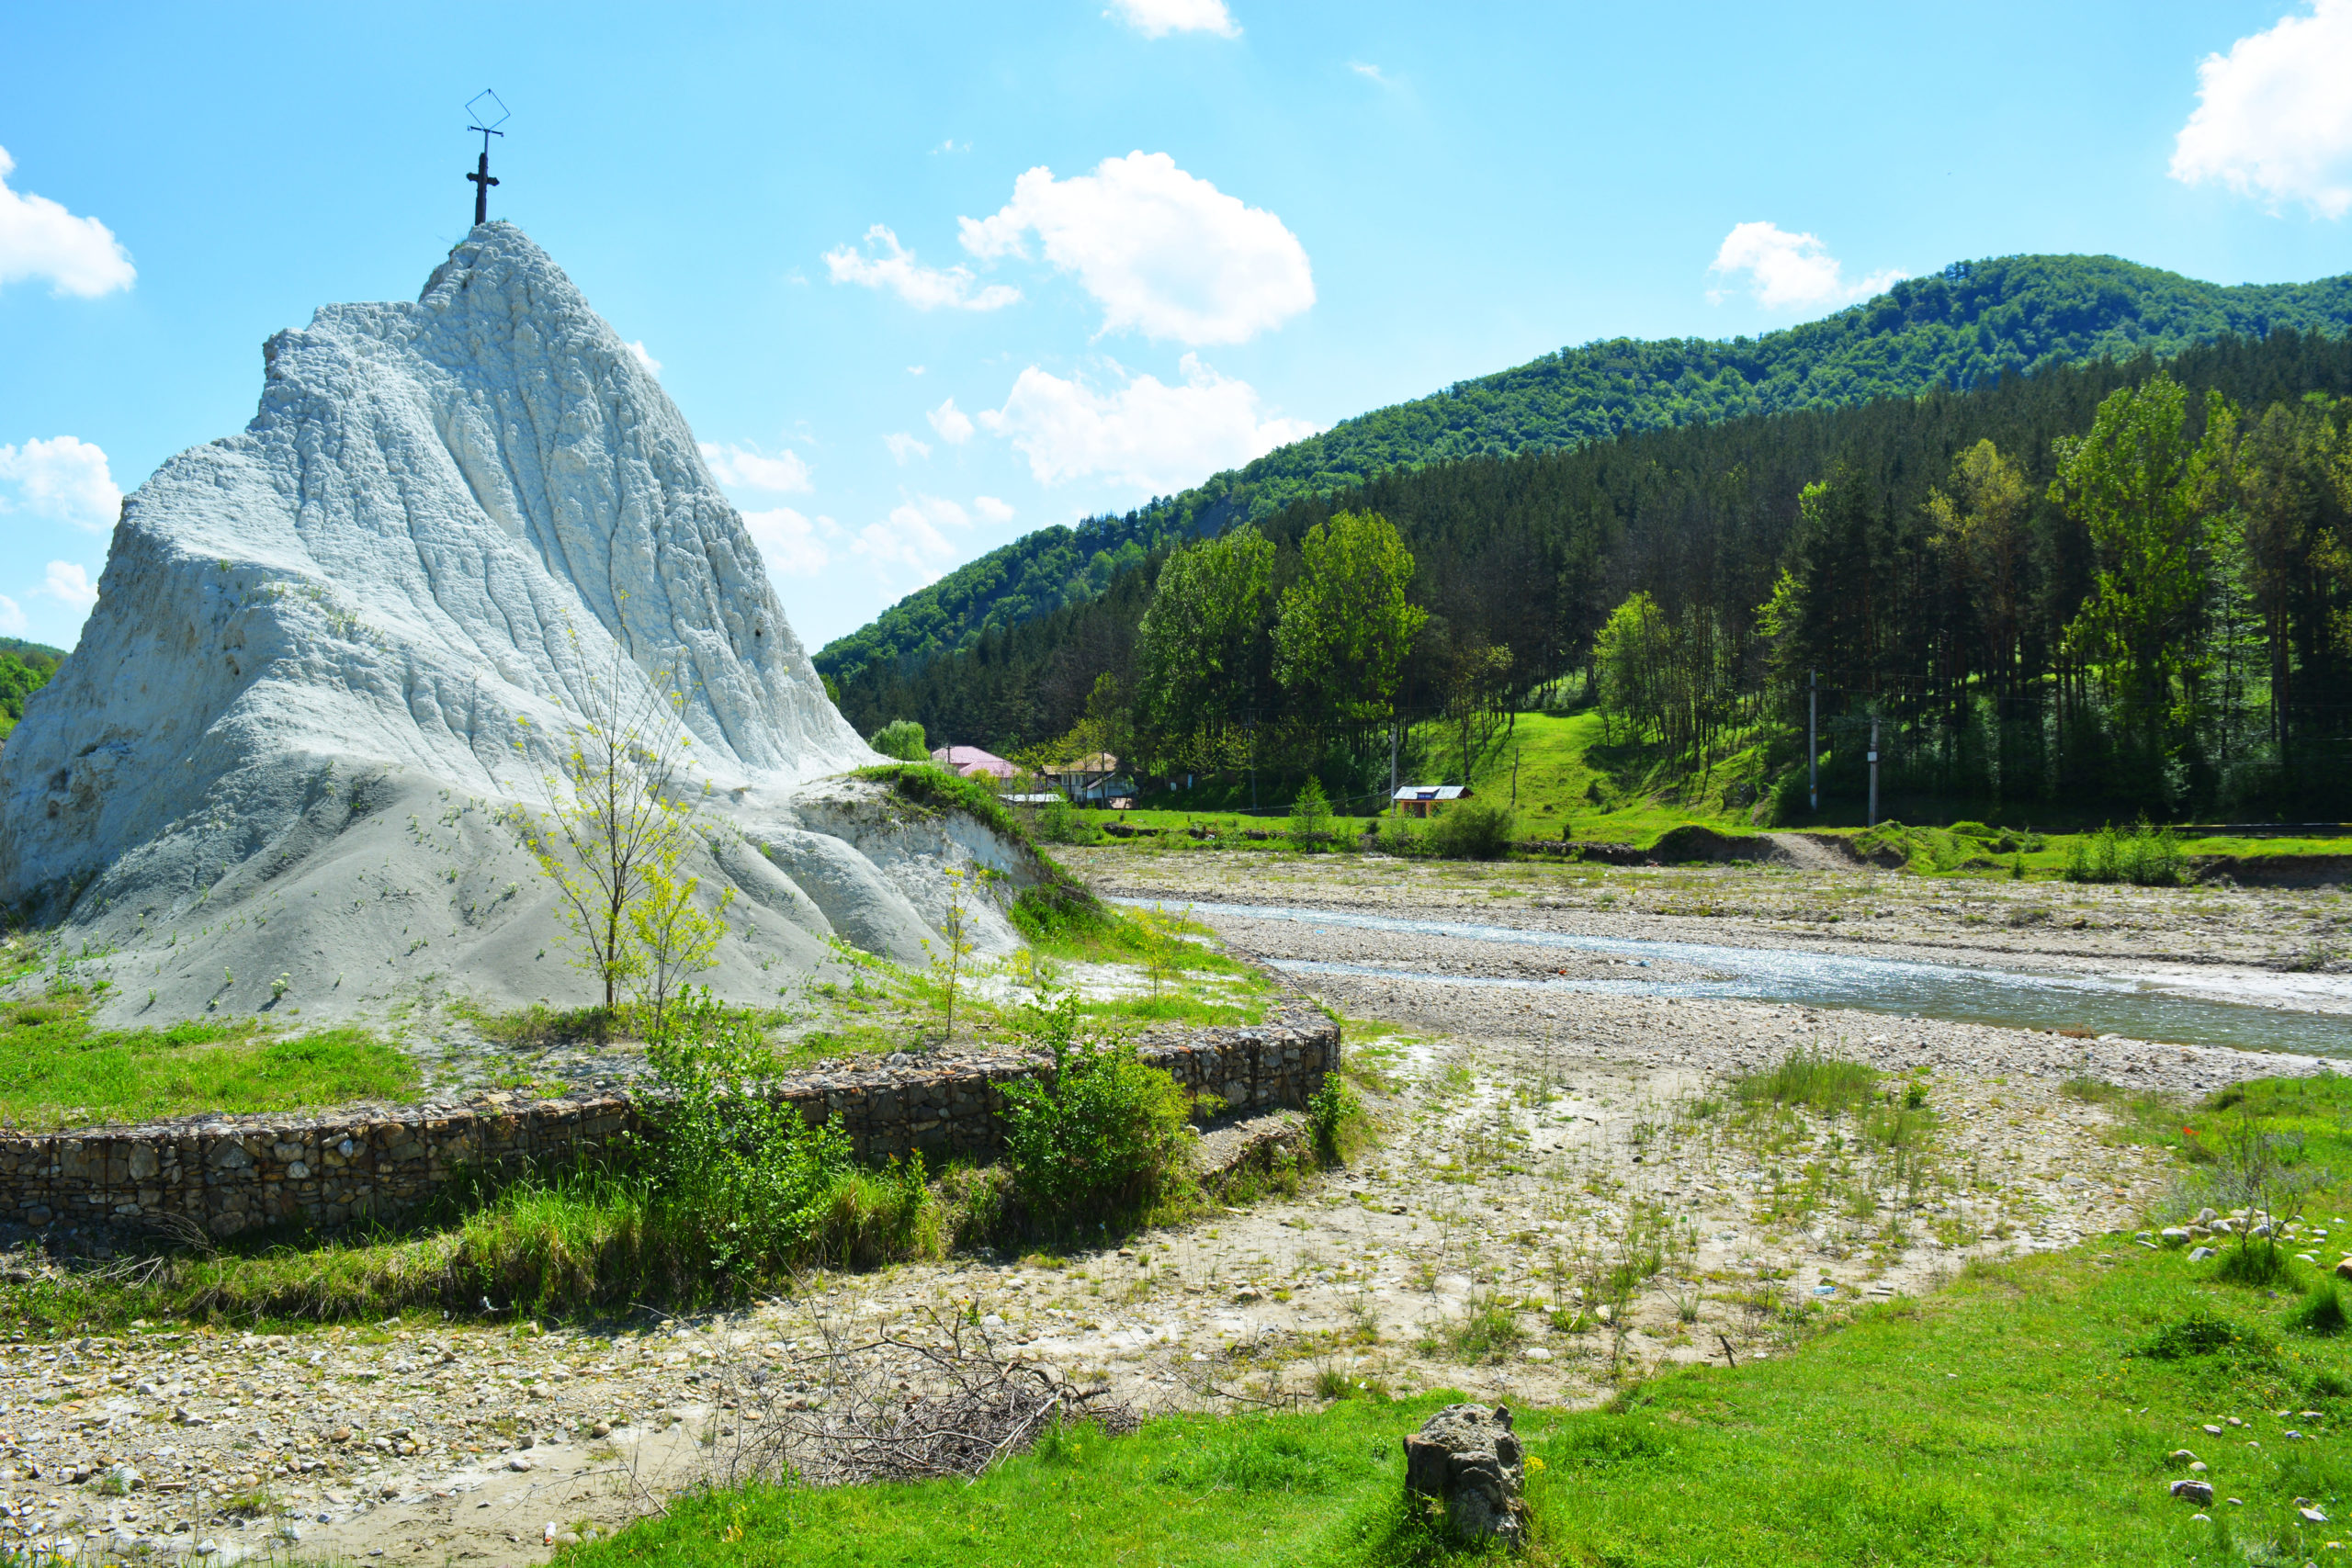 White Rock of Grunj, Buzau